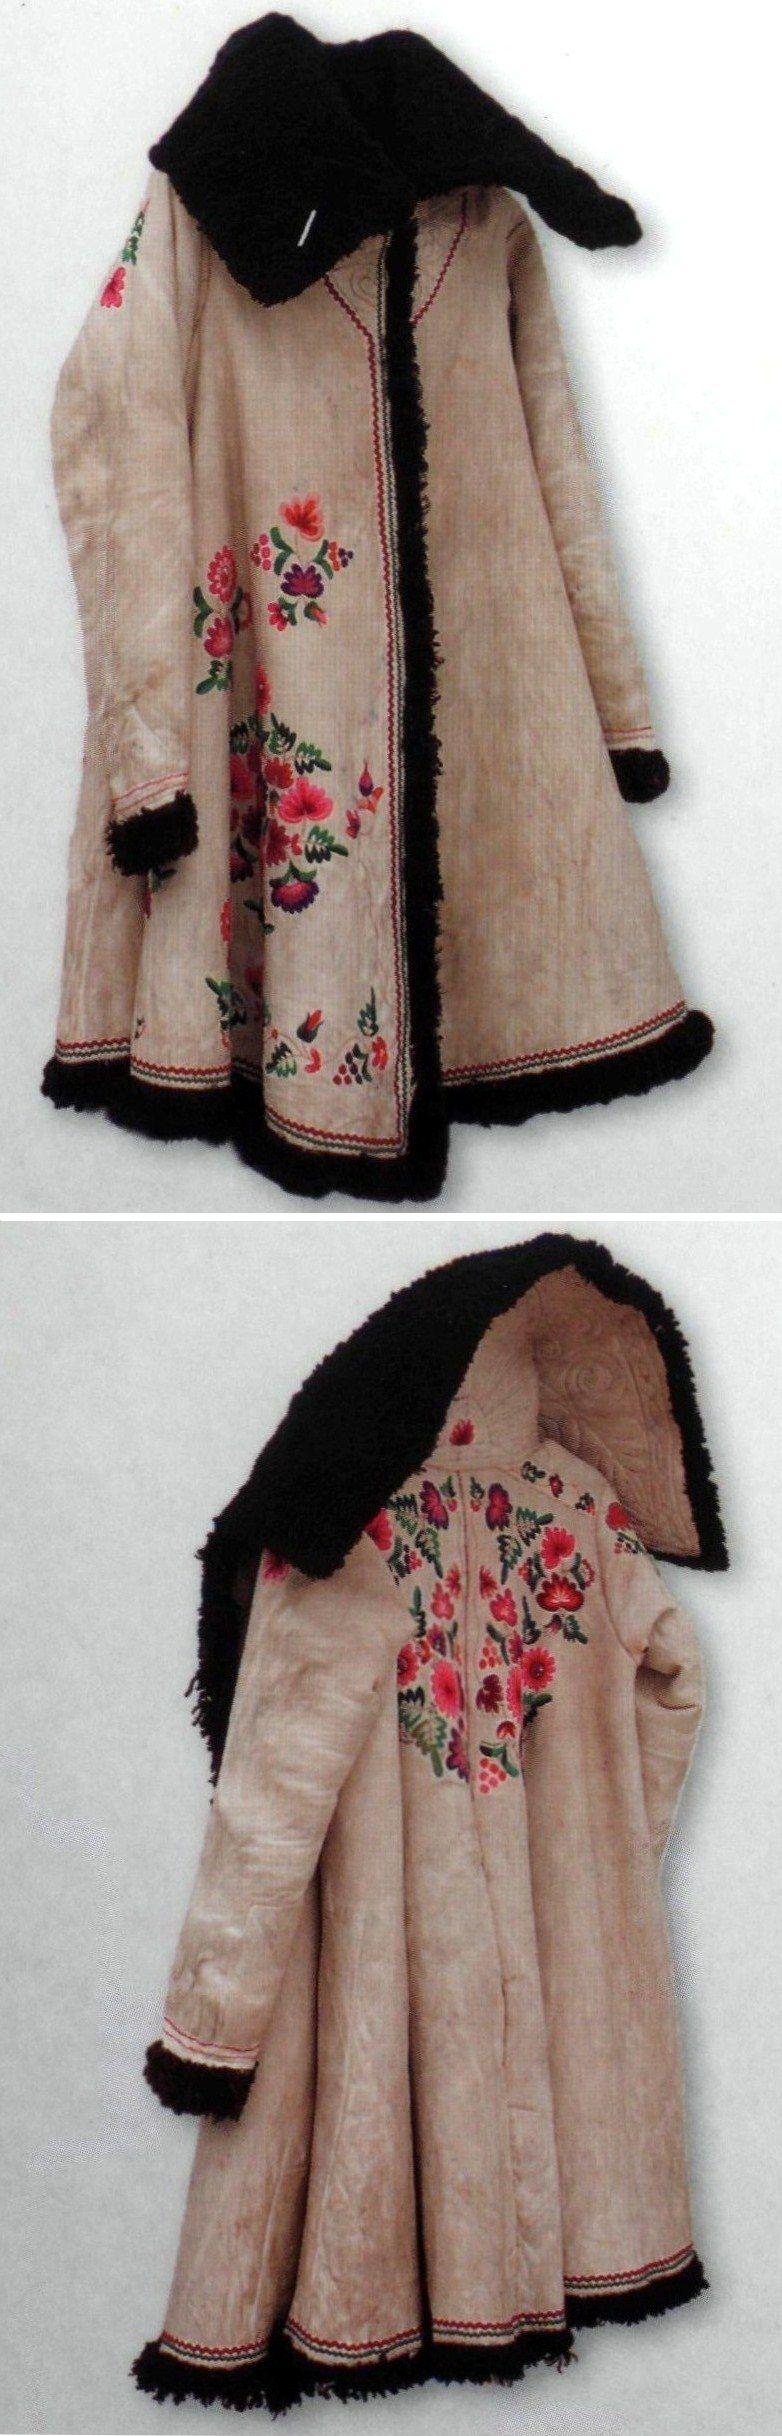 Winter coat of a Russian peasant woman. Fur sheepskin; embroidery. 19th century. #Russia #folk #national #costume